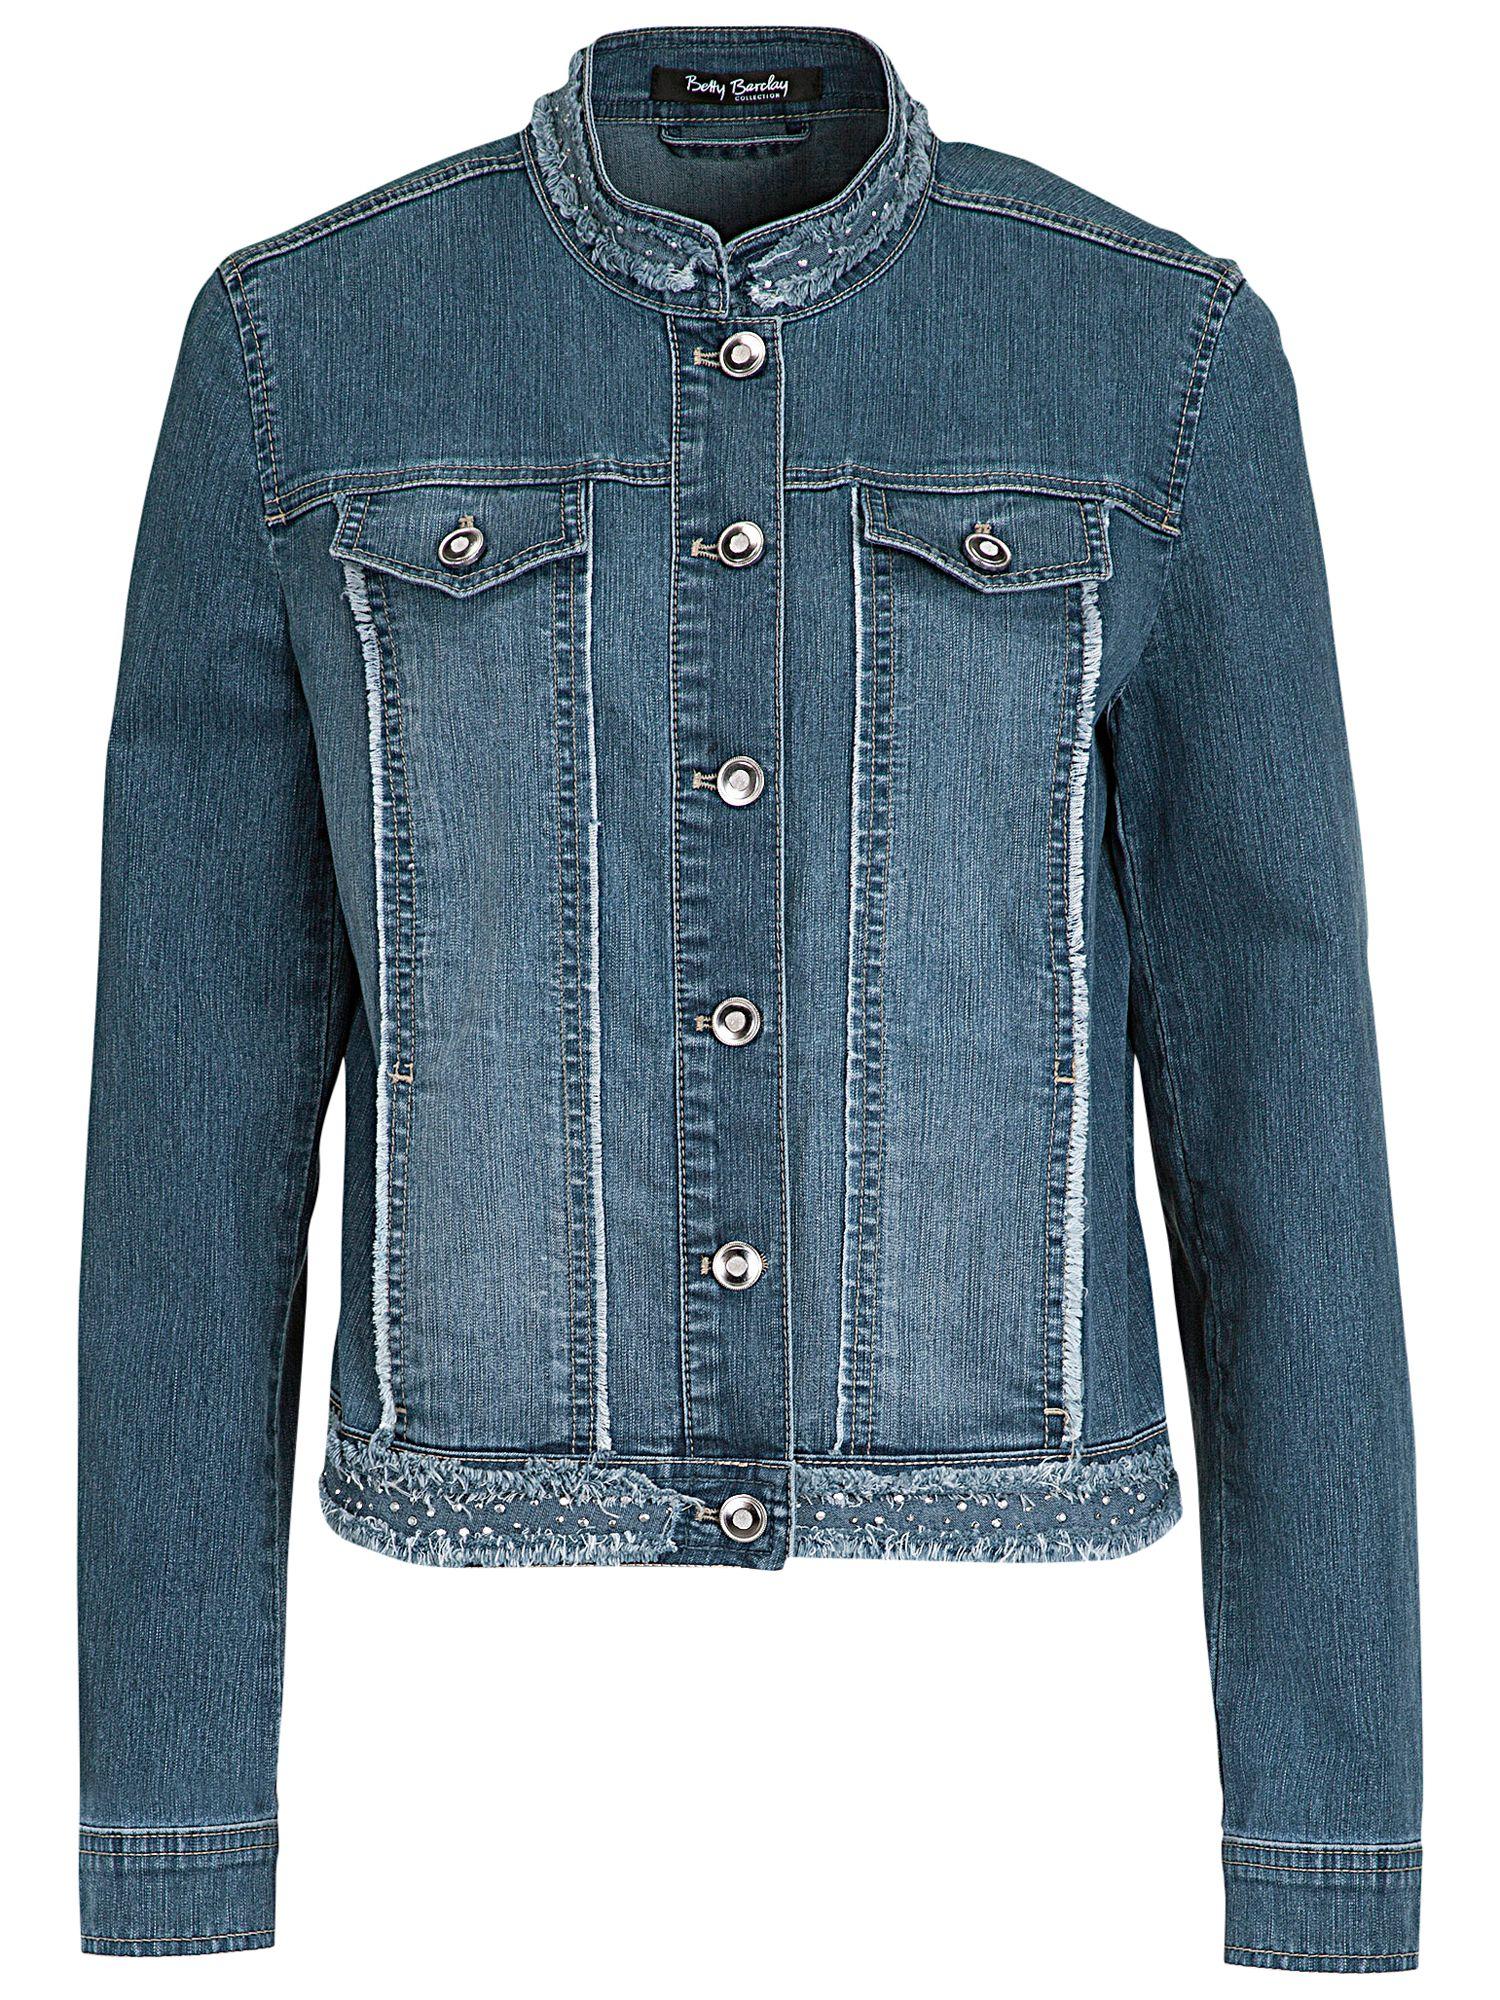 Betty barclay leather jacket